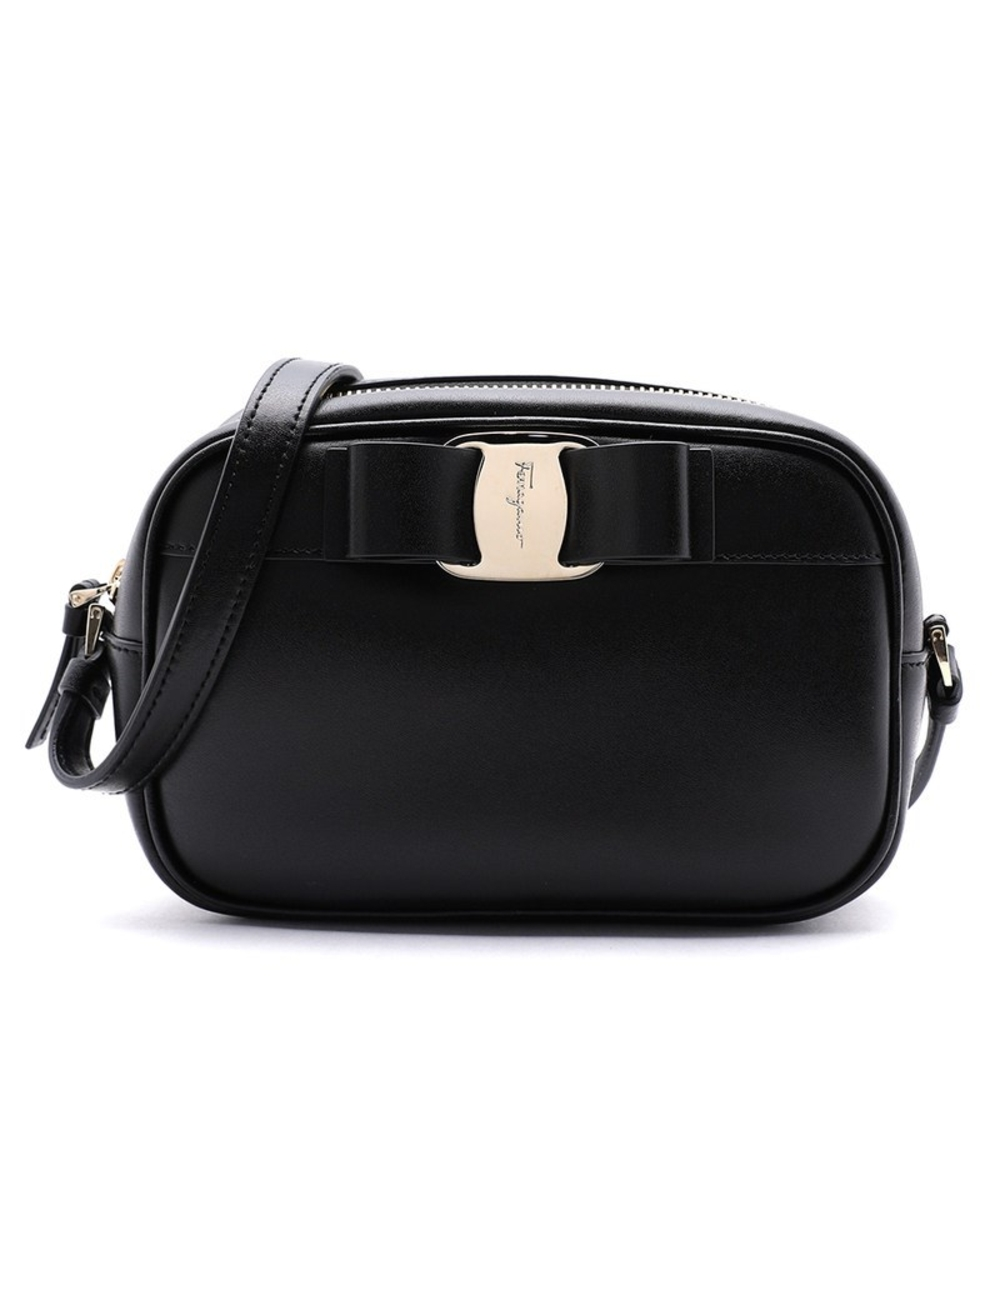 Salvatore Ferragamo女士Vara弓相機包 類別:女裝> BAG>手提袋>手提袋 年份:假 顏色代碼(RGB代碼):#030303 性別:女性